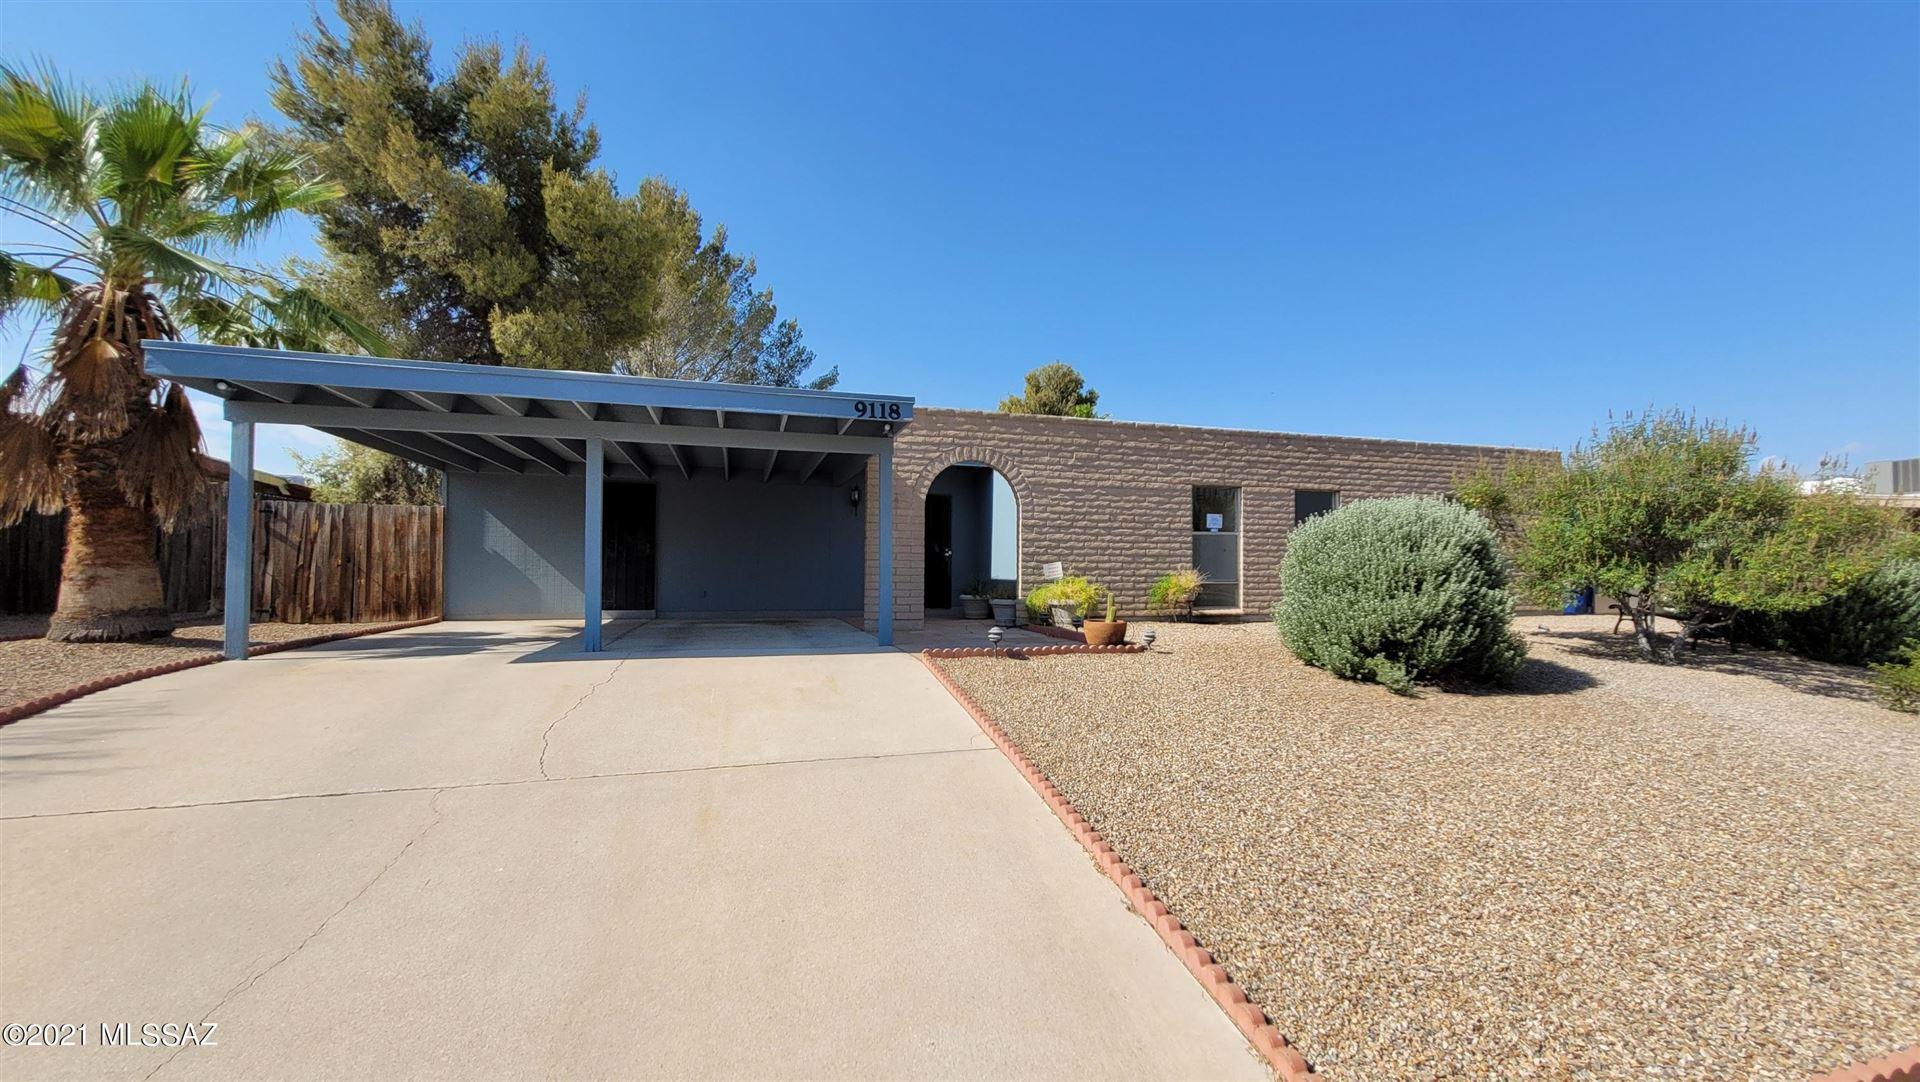 9118 E Calle Cascada, Tucson, AZ 85715 - MLS#: 22116613